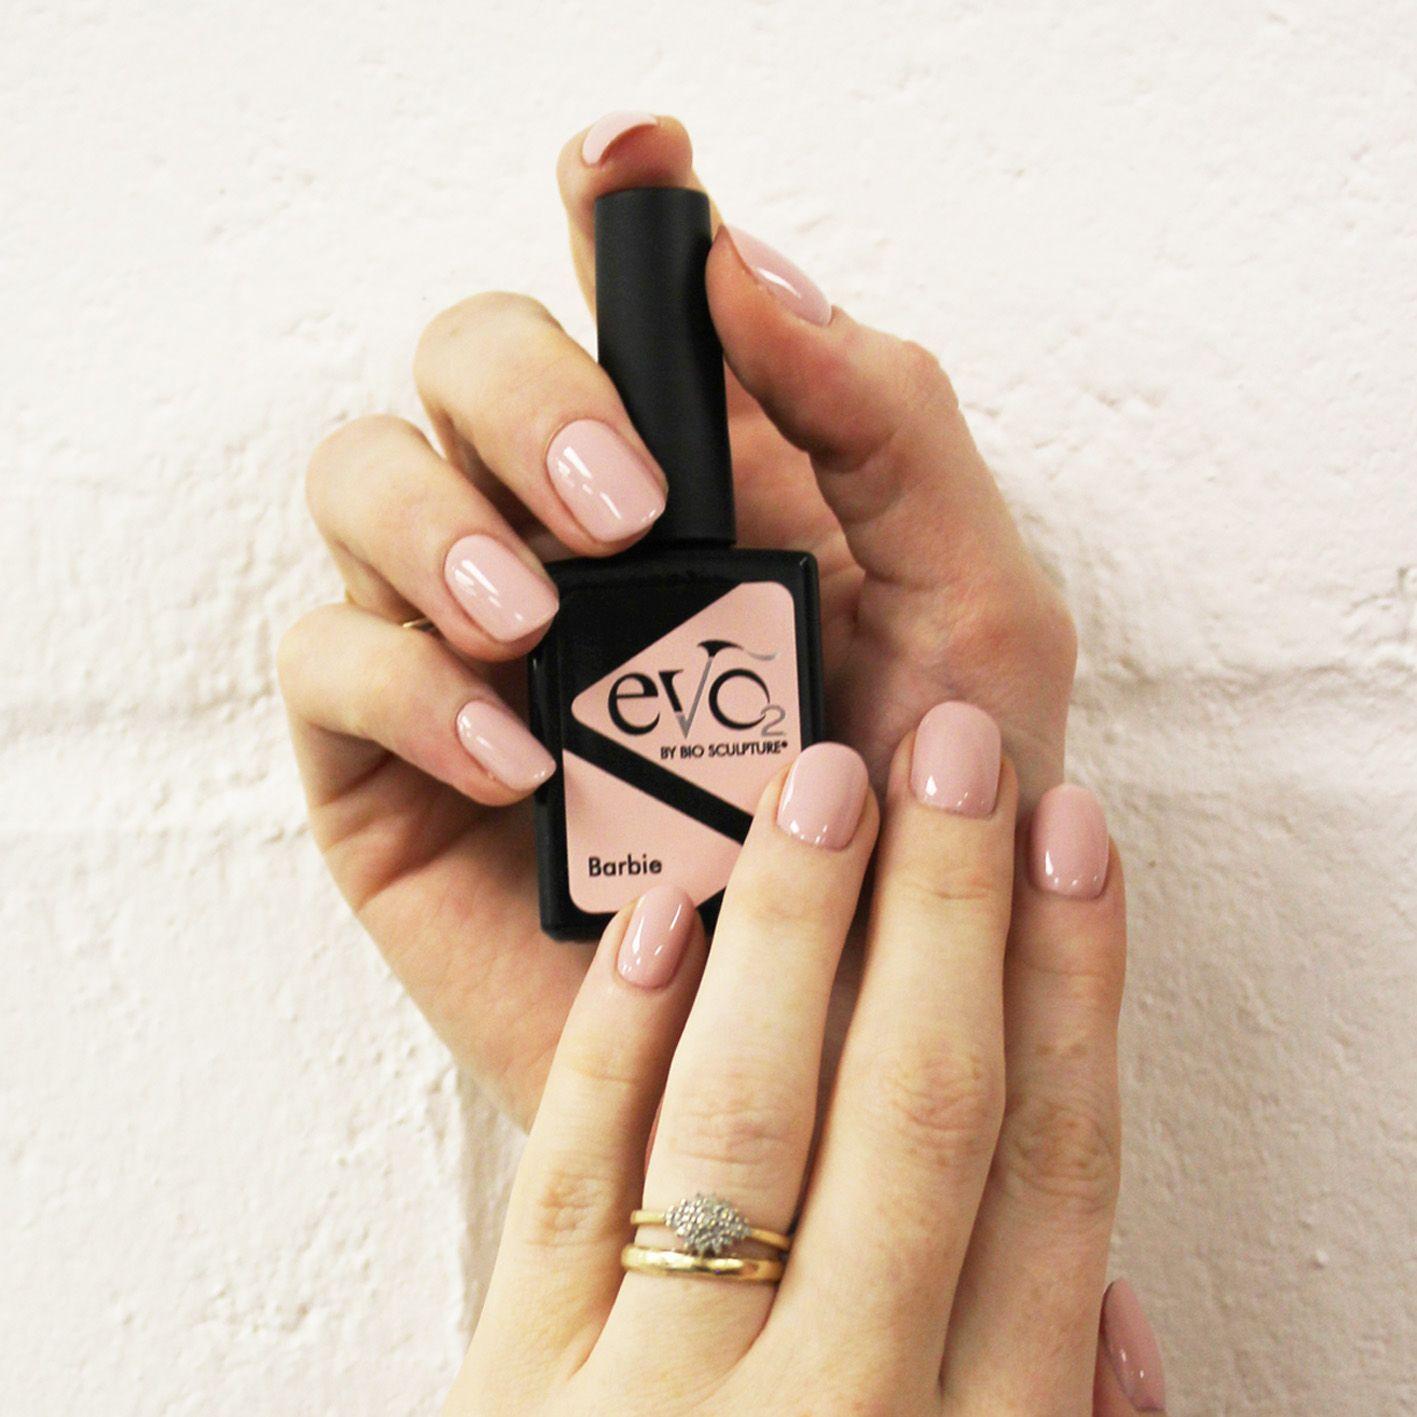 evo barbie nails and nail art ideas pinterest evo